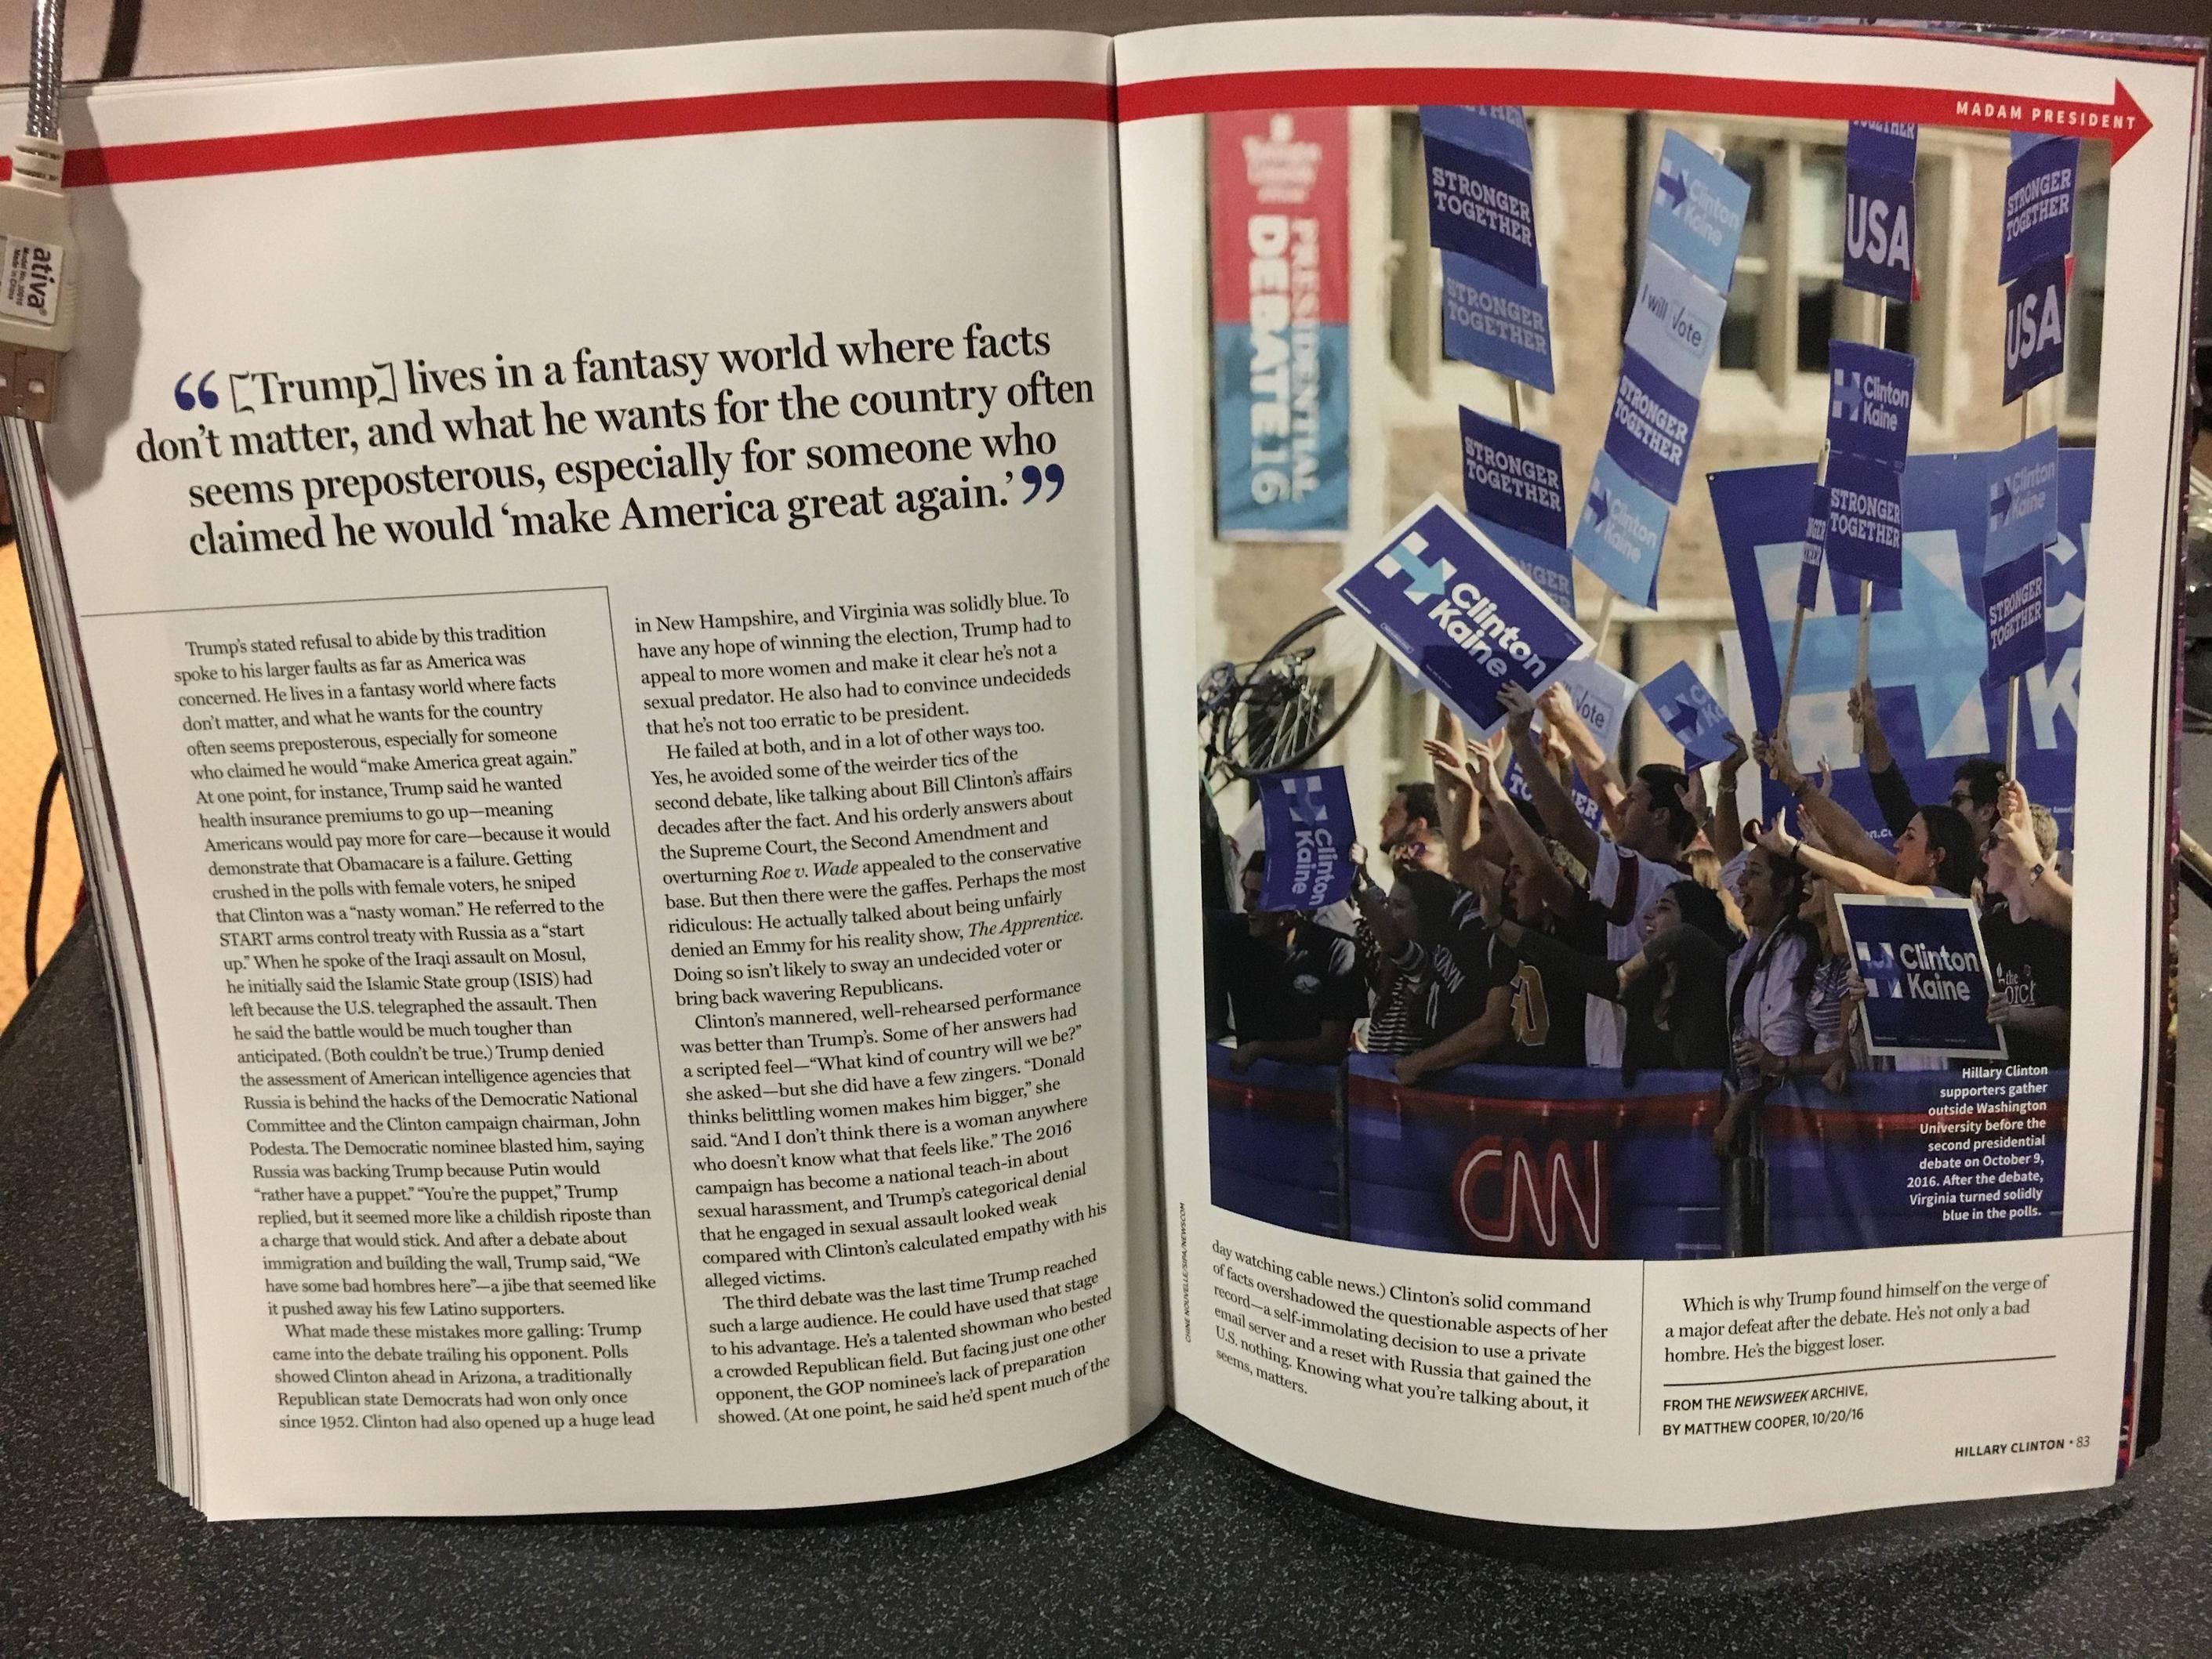 newsweek-madame-hillary-clinton-page-42